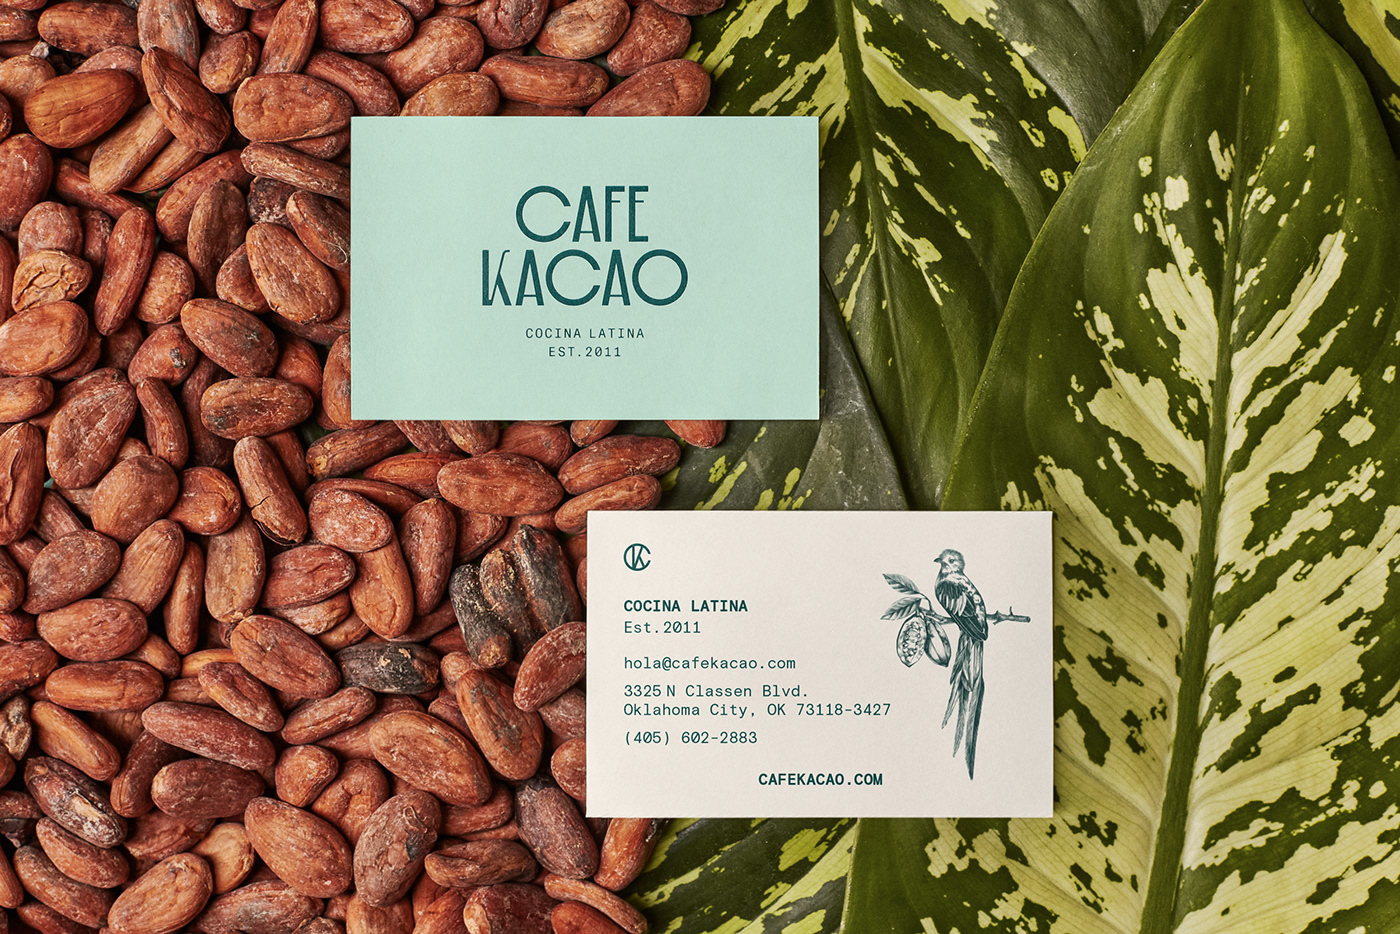 branding  cafe kacao Cocoa Coffee latin food latinoamerica mexico restaurant vegrande